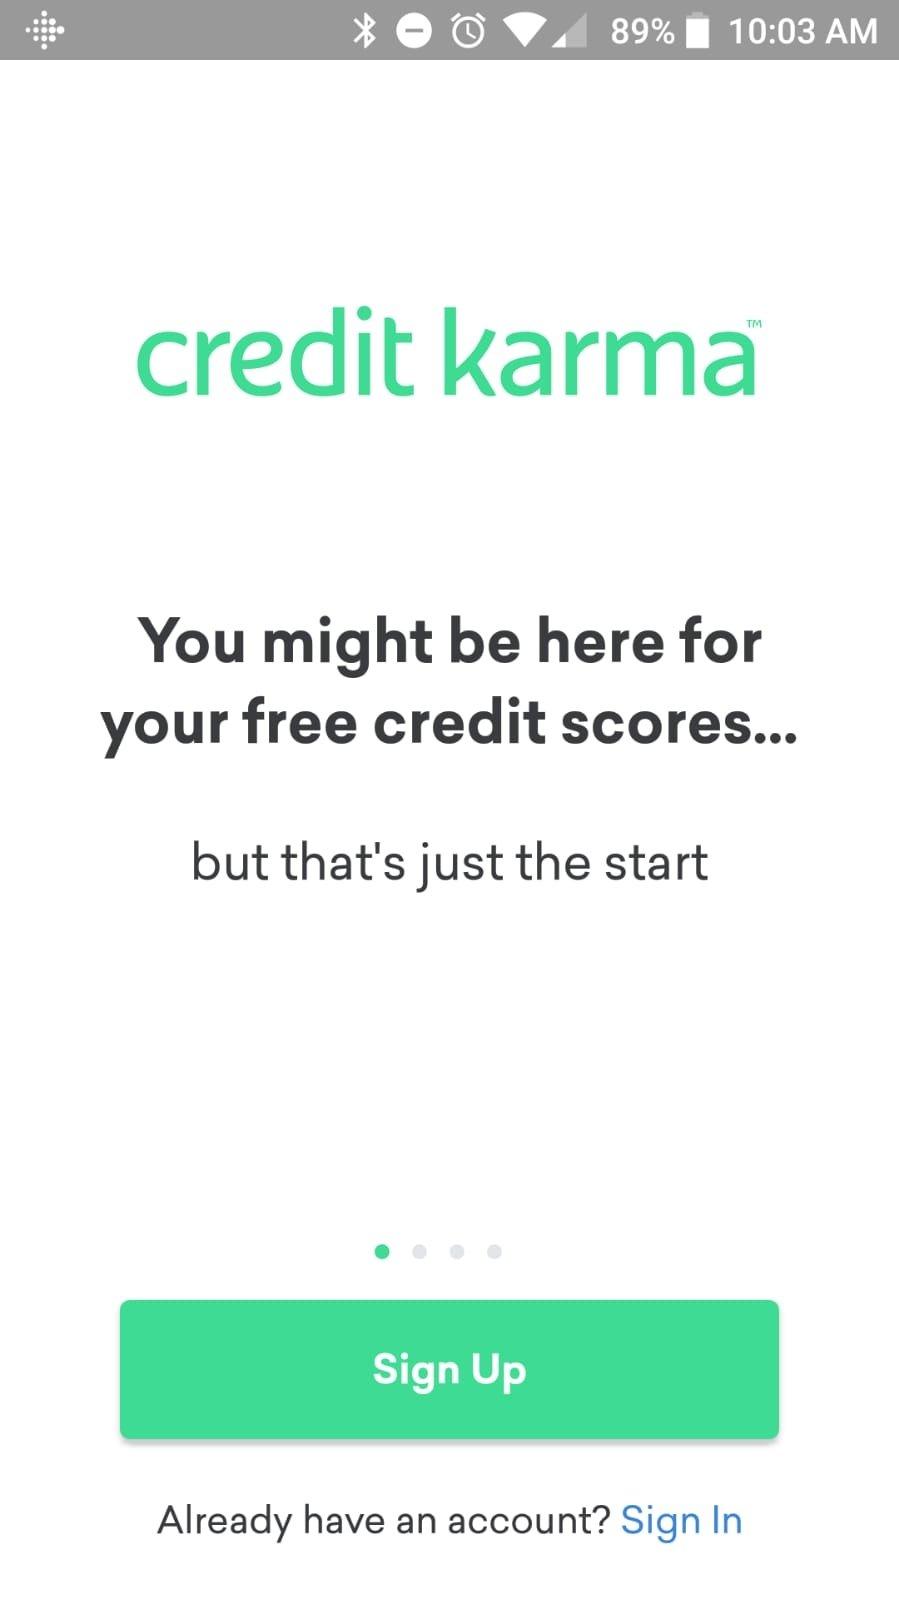 Credit Karma Android image 5